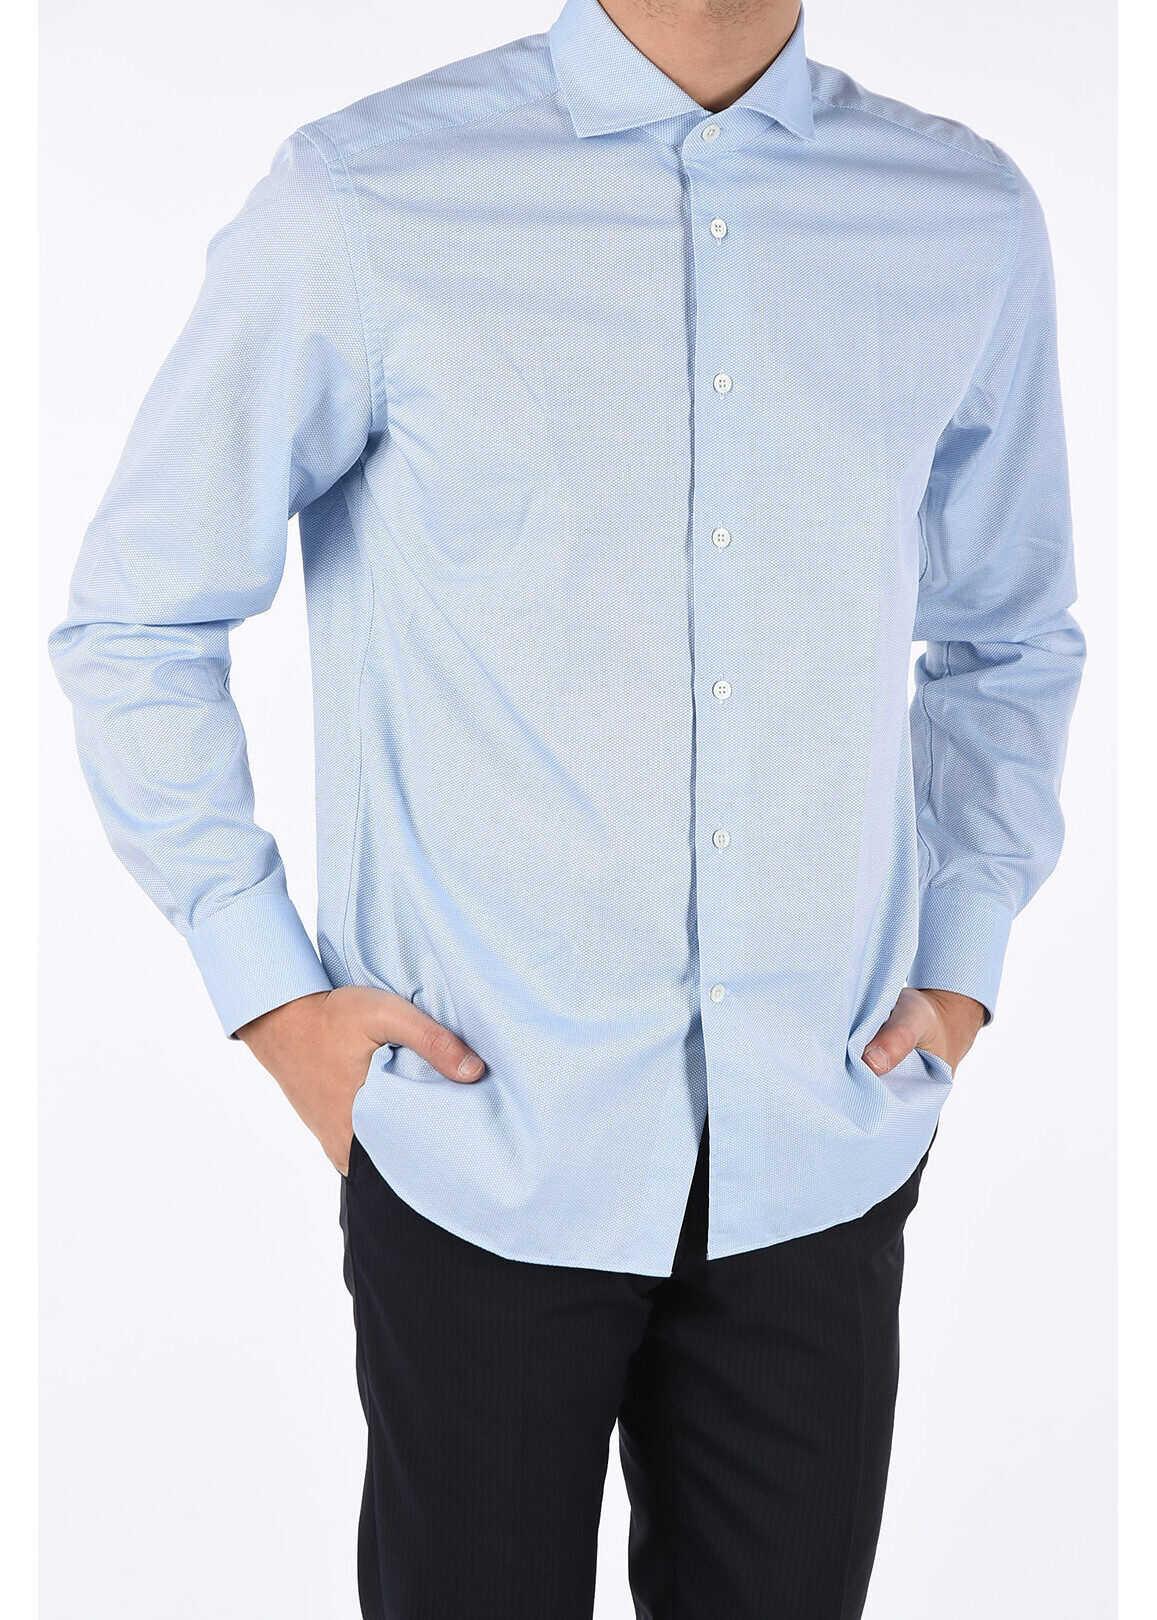 CORNELIANI Semi-French Neck Shirt LIGHT BLUE imagine